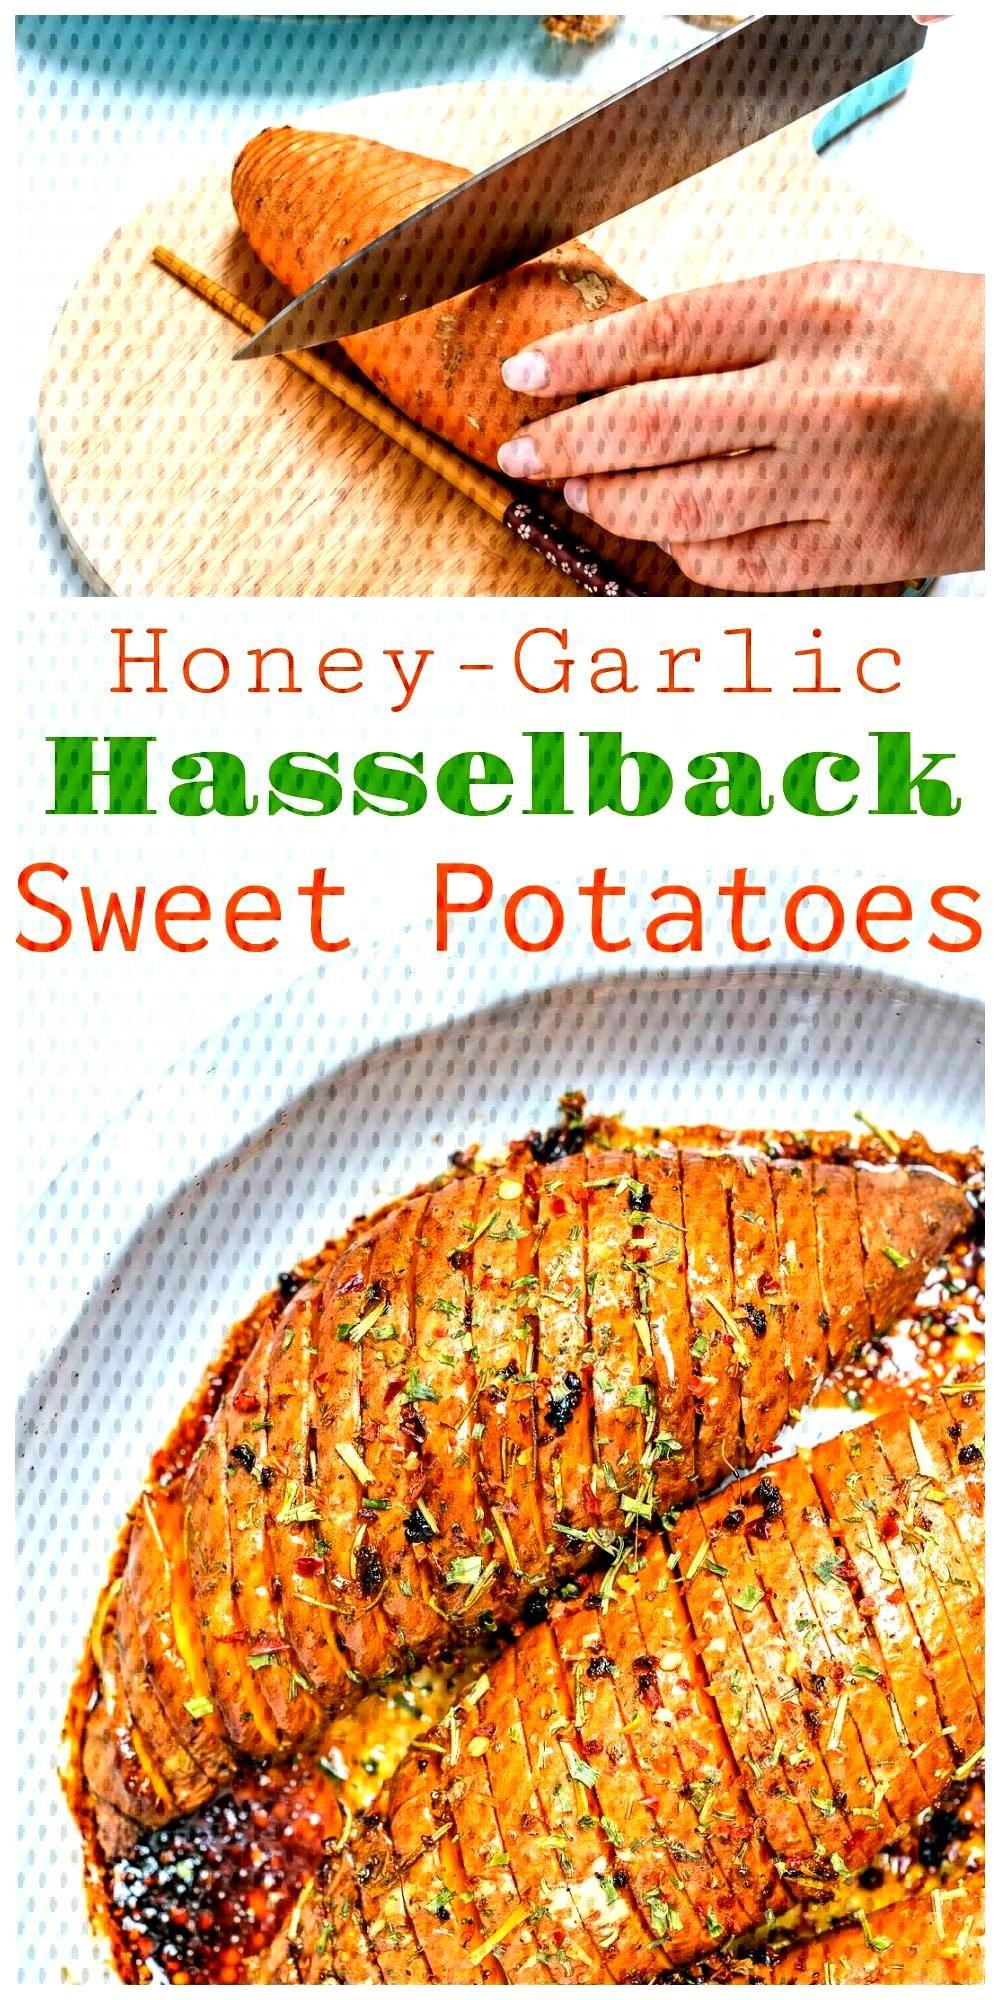 Honey + Garlic Hasselback Sweet Potatoes for Creative Clean Eats! - Cle...